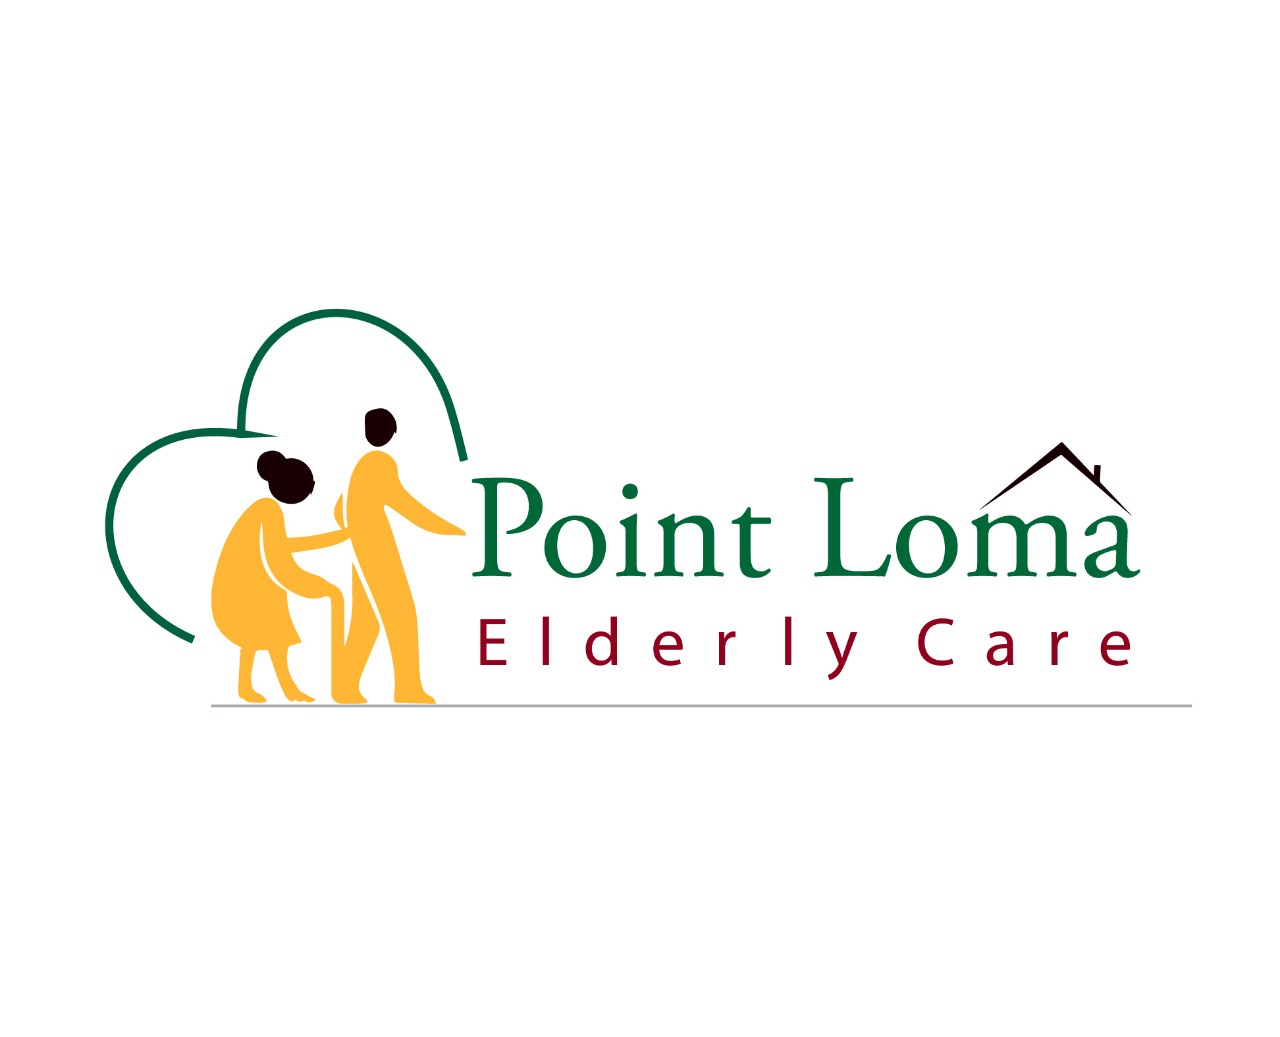 Logo pointloma.jpg